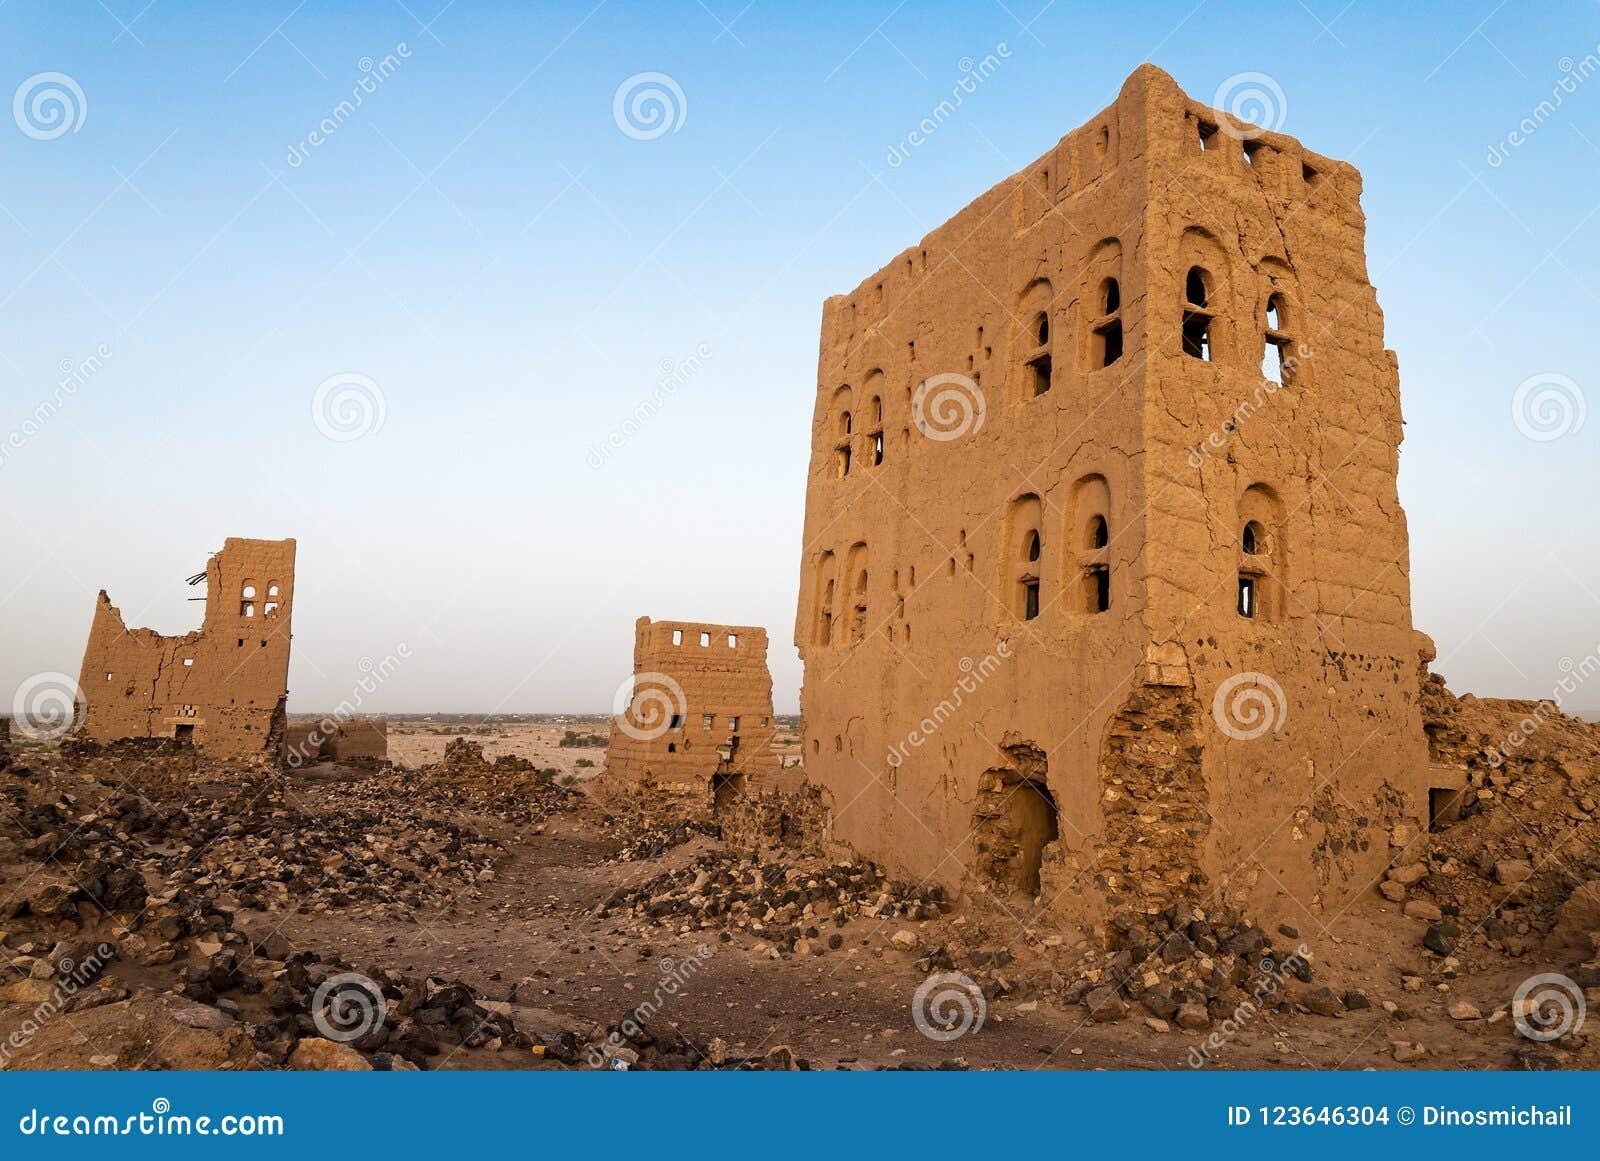 Buildings in Yemen